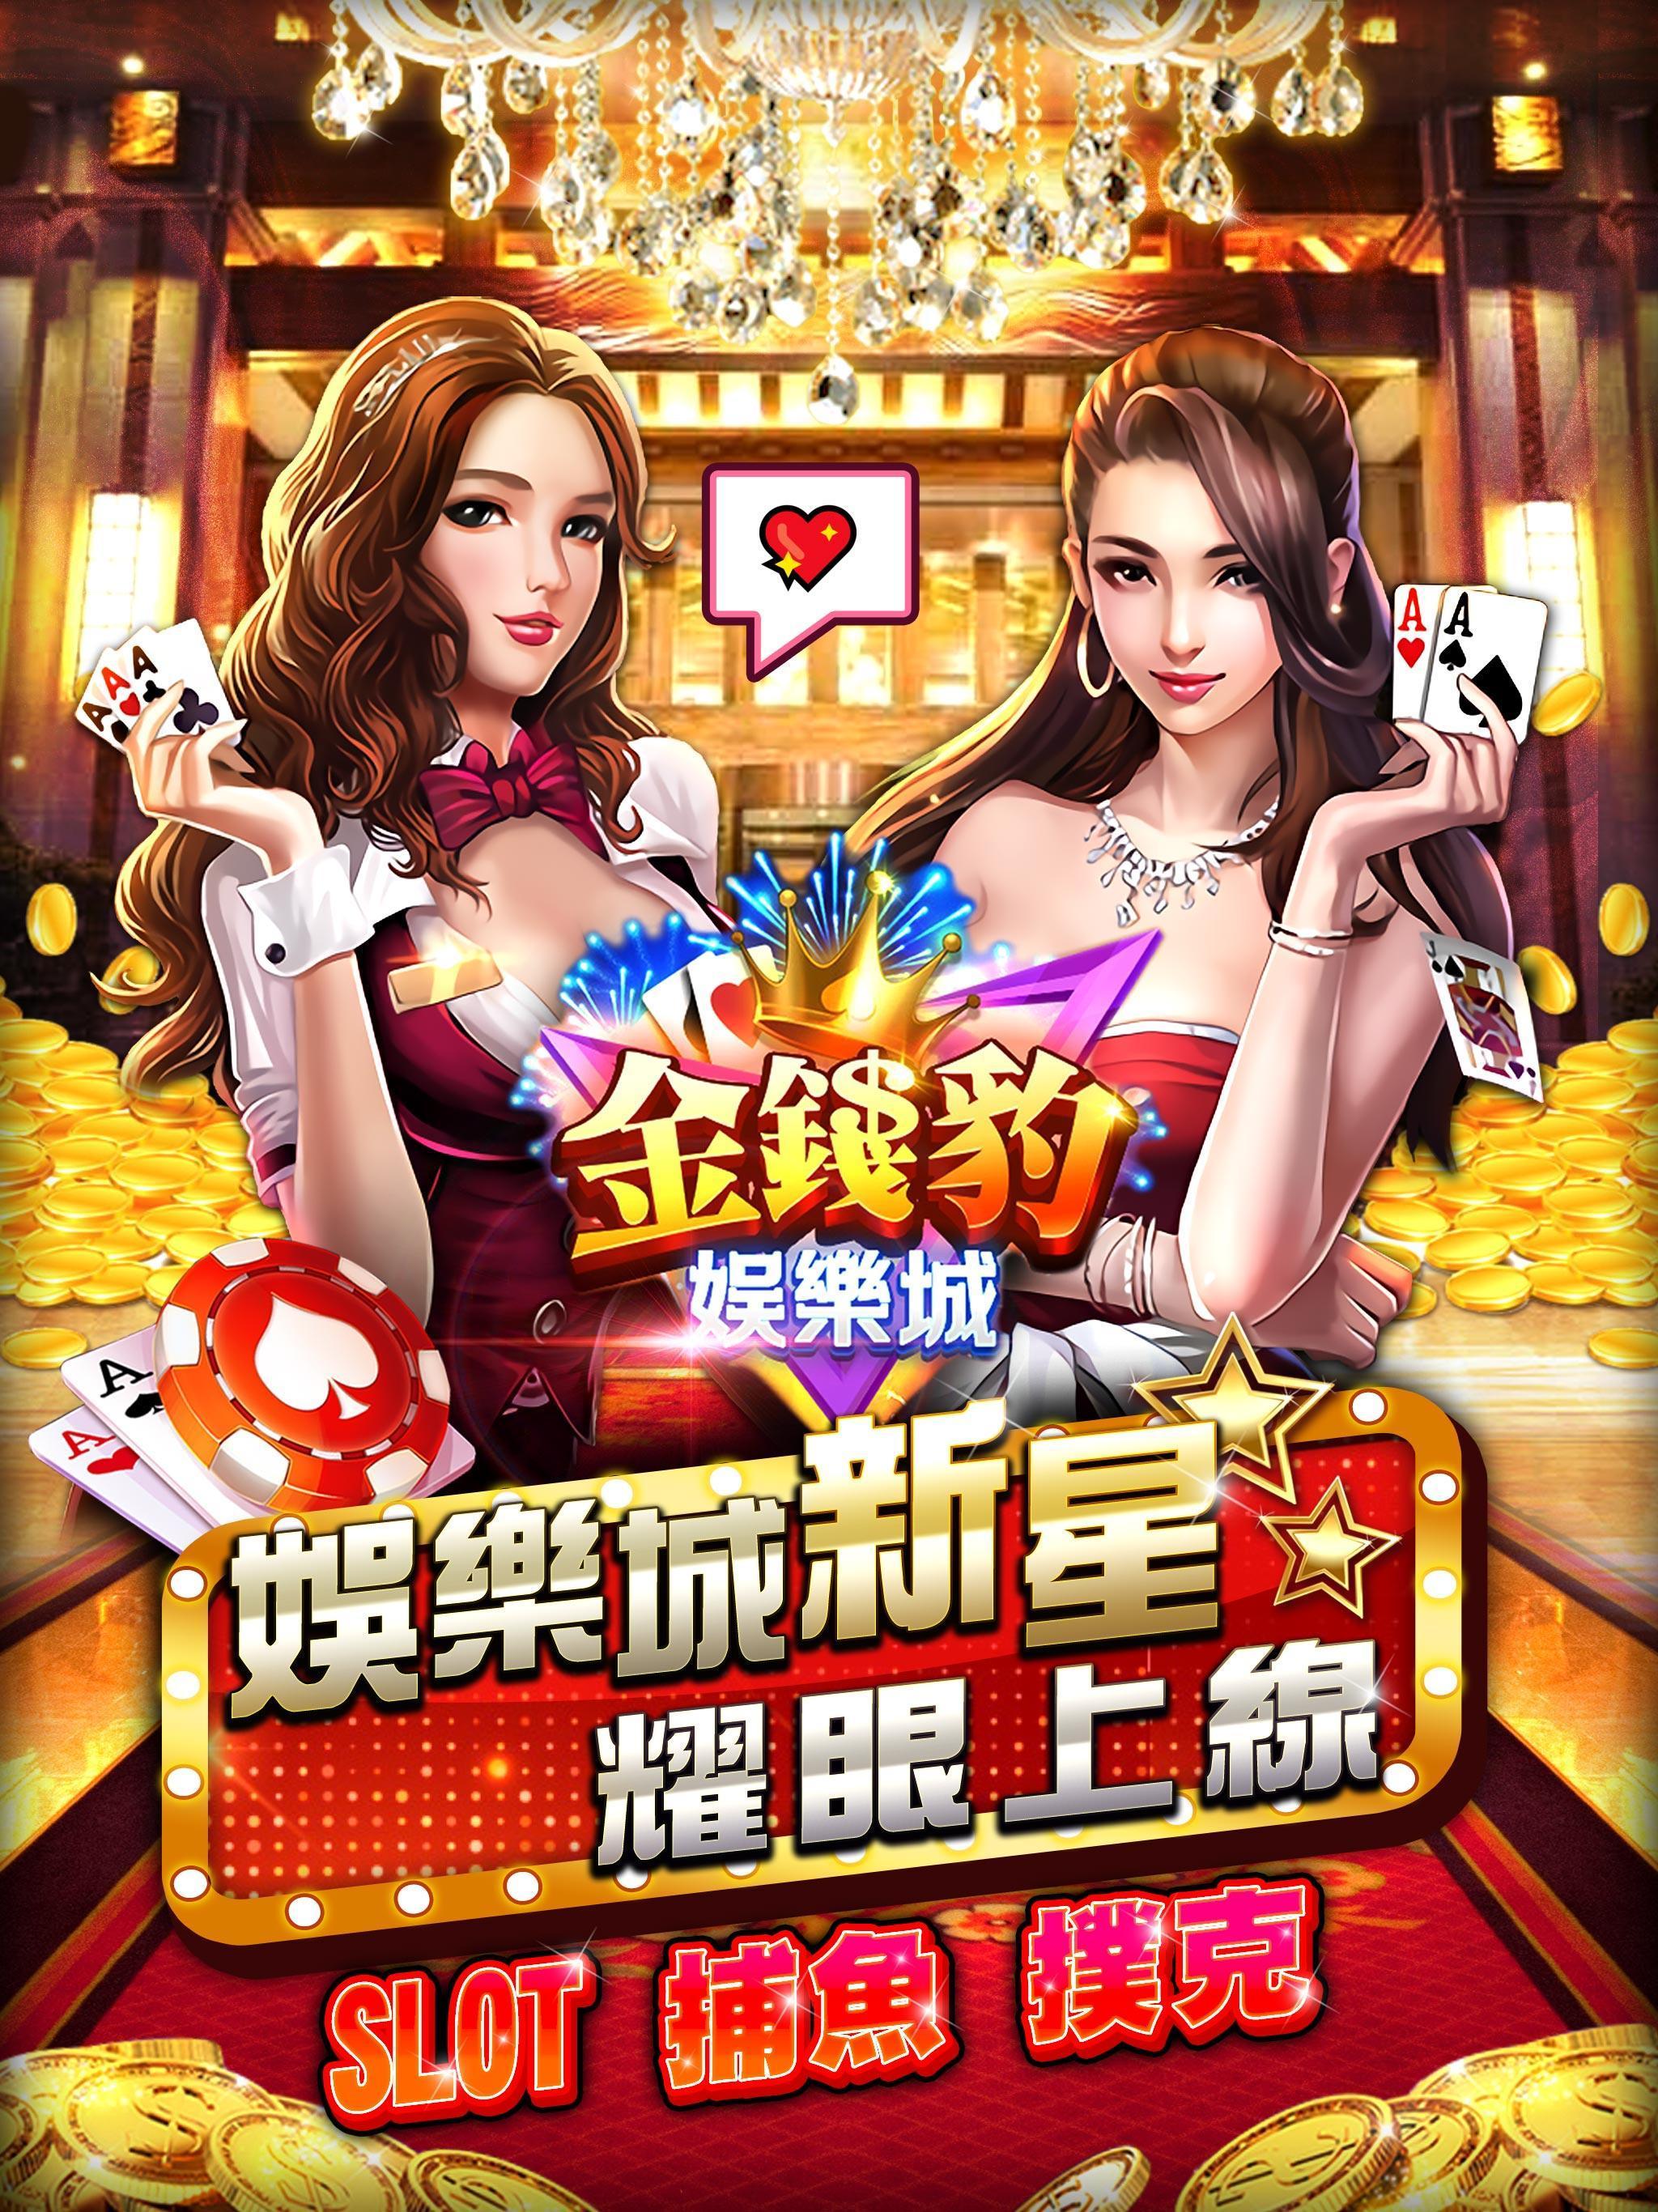 金錢豹娛樂城 2.0.0 Screenshot 6